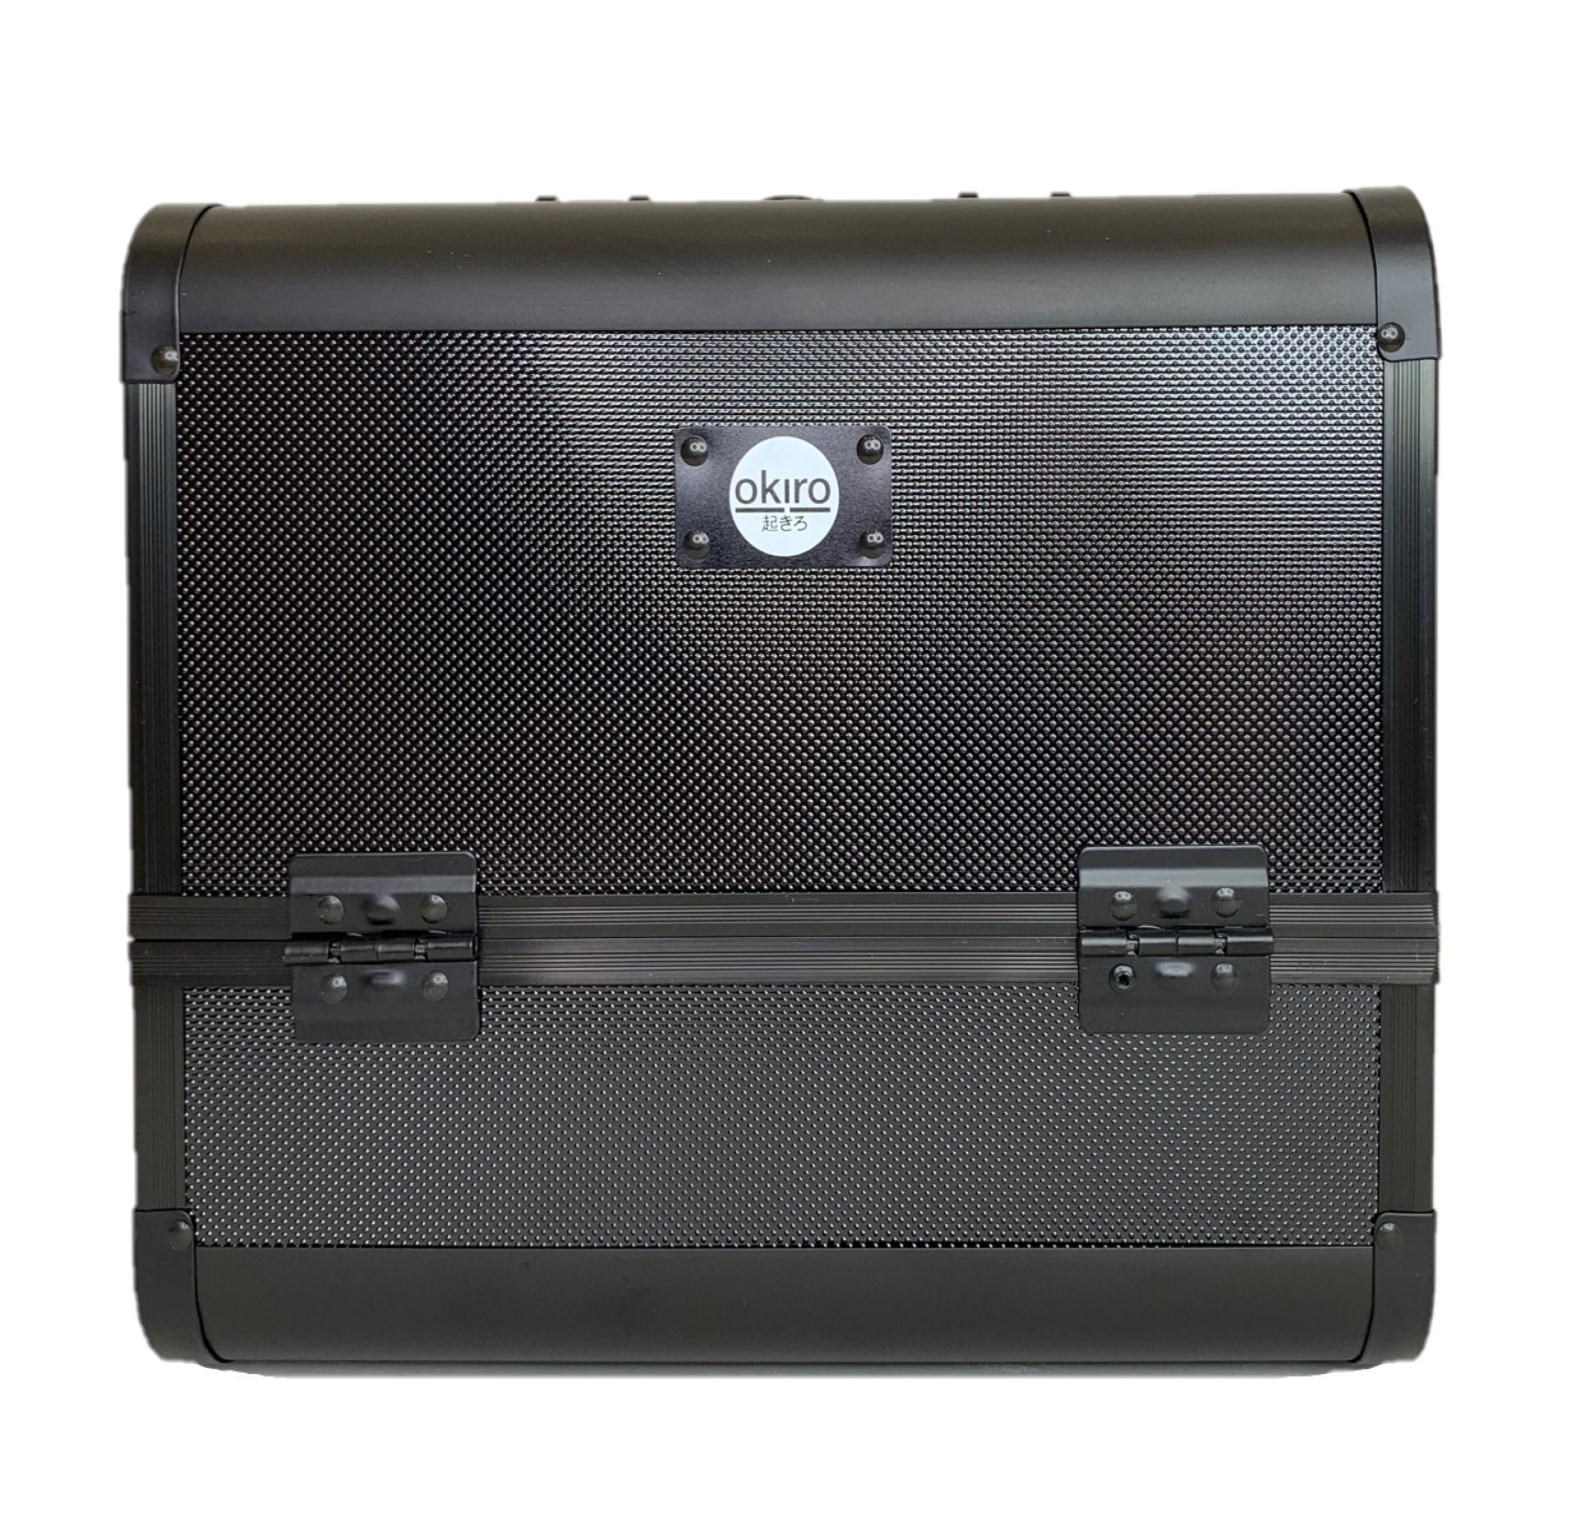 Бьюти-кейс унисекс OKIRO MC 074 черный